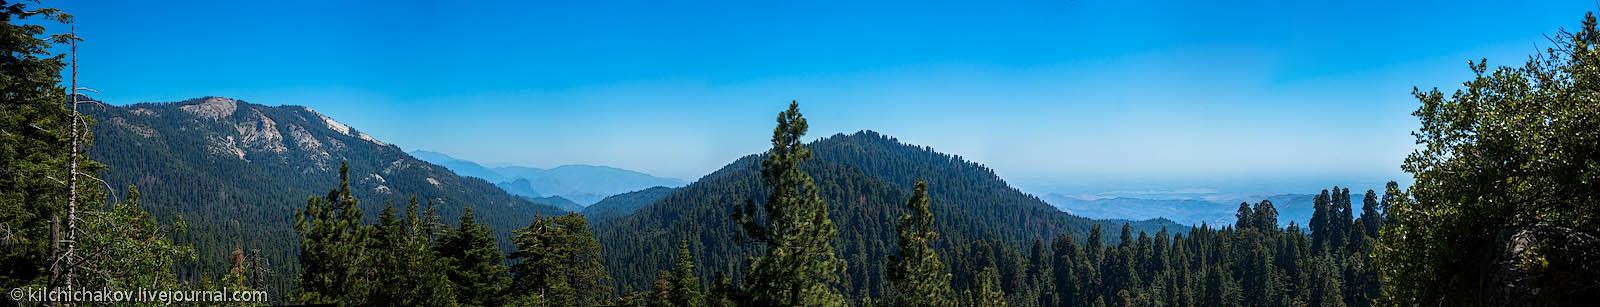 DSC02383 Panorama copy